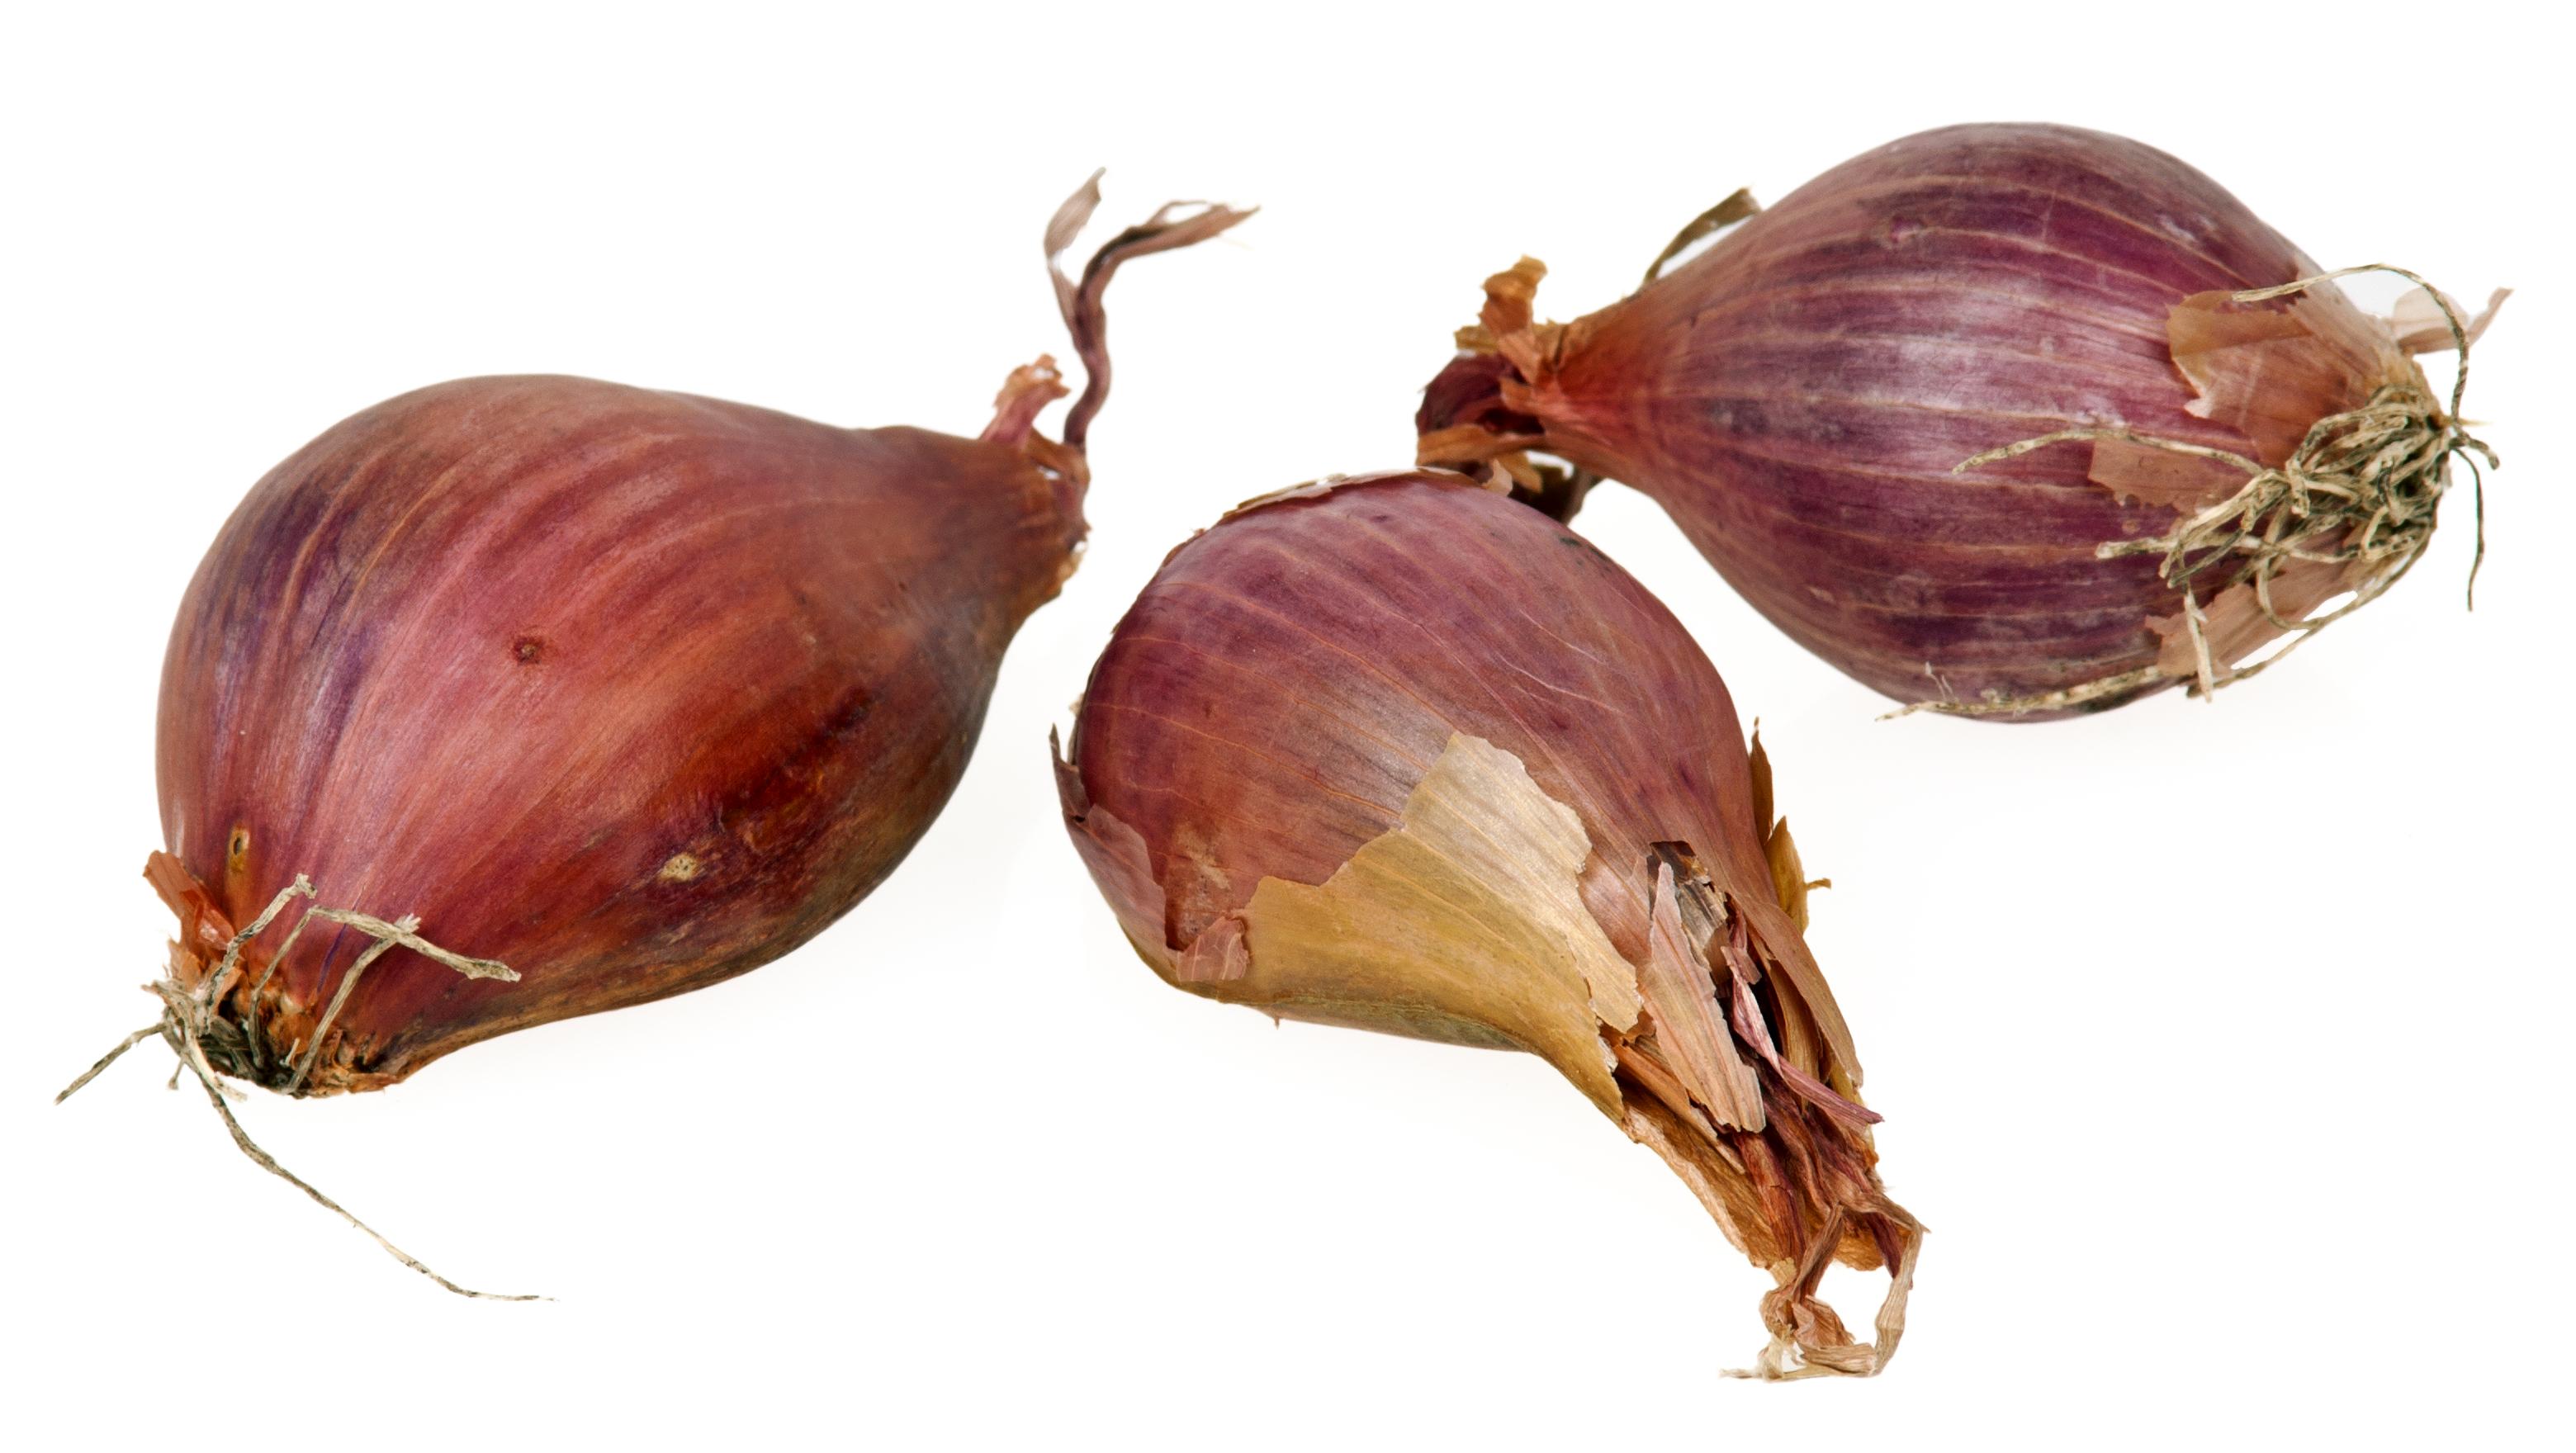 Shallot Onion.